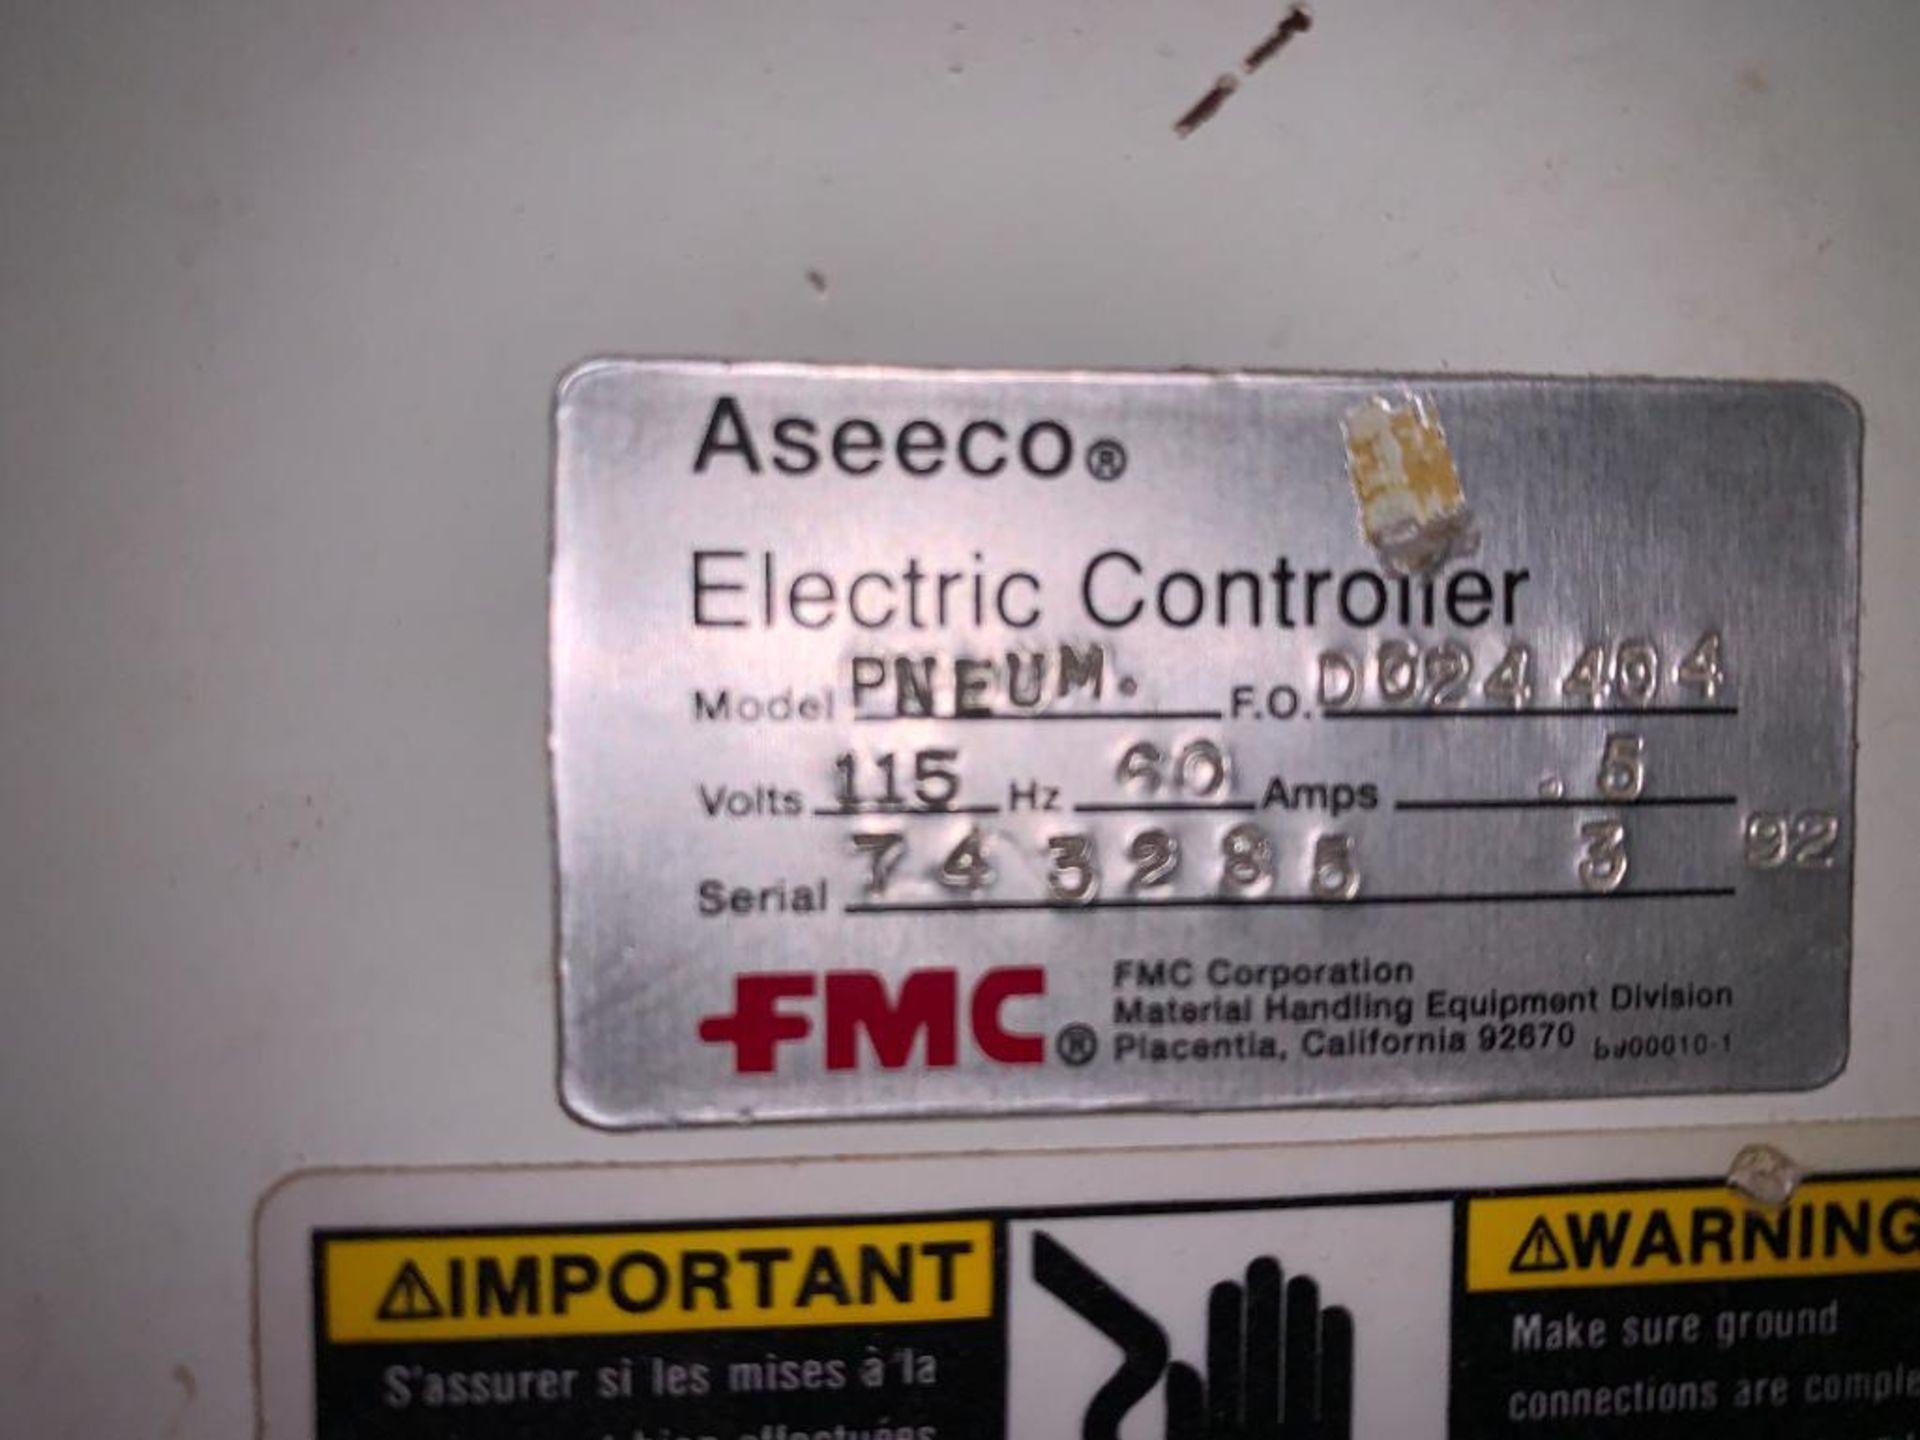 Aseeco mild steel cone bottom bulk storage bin - Image 10 of 23